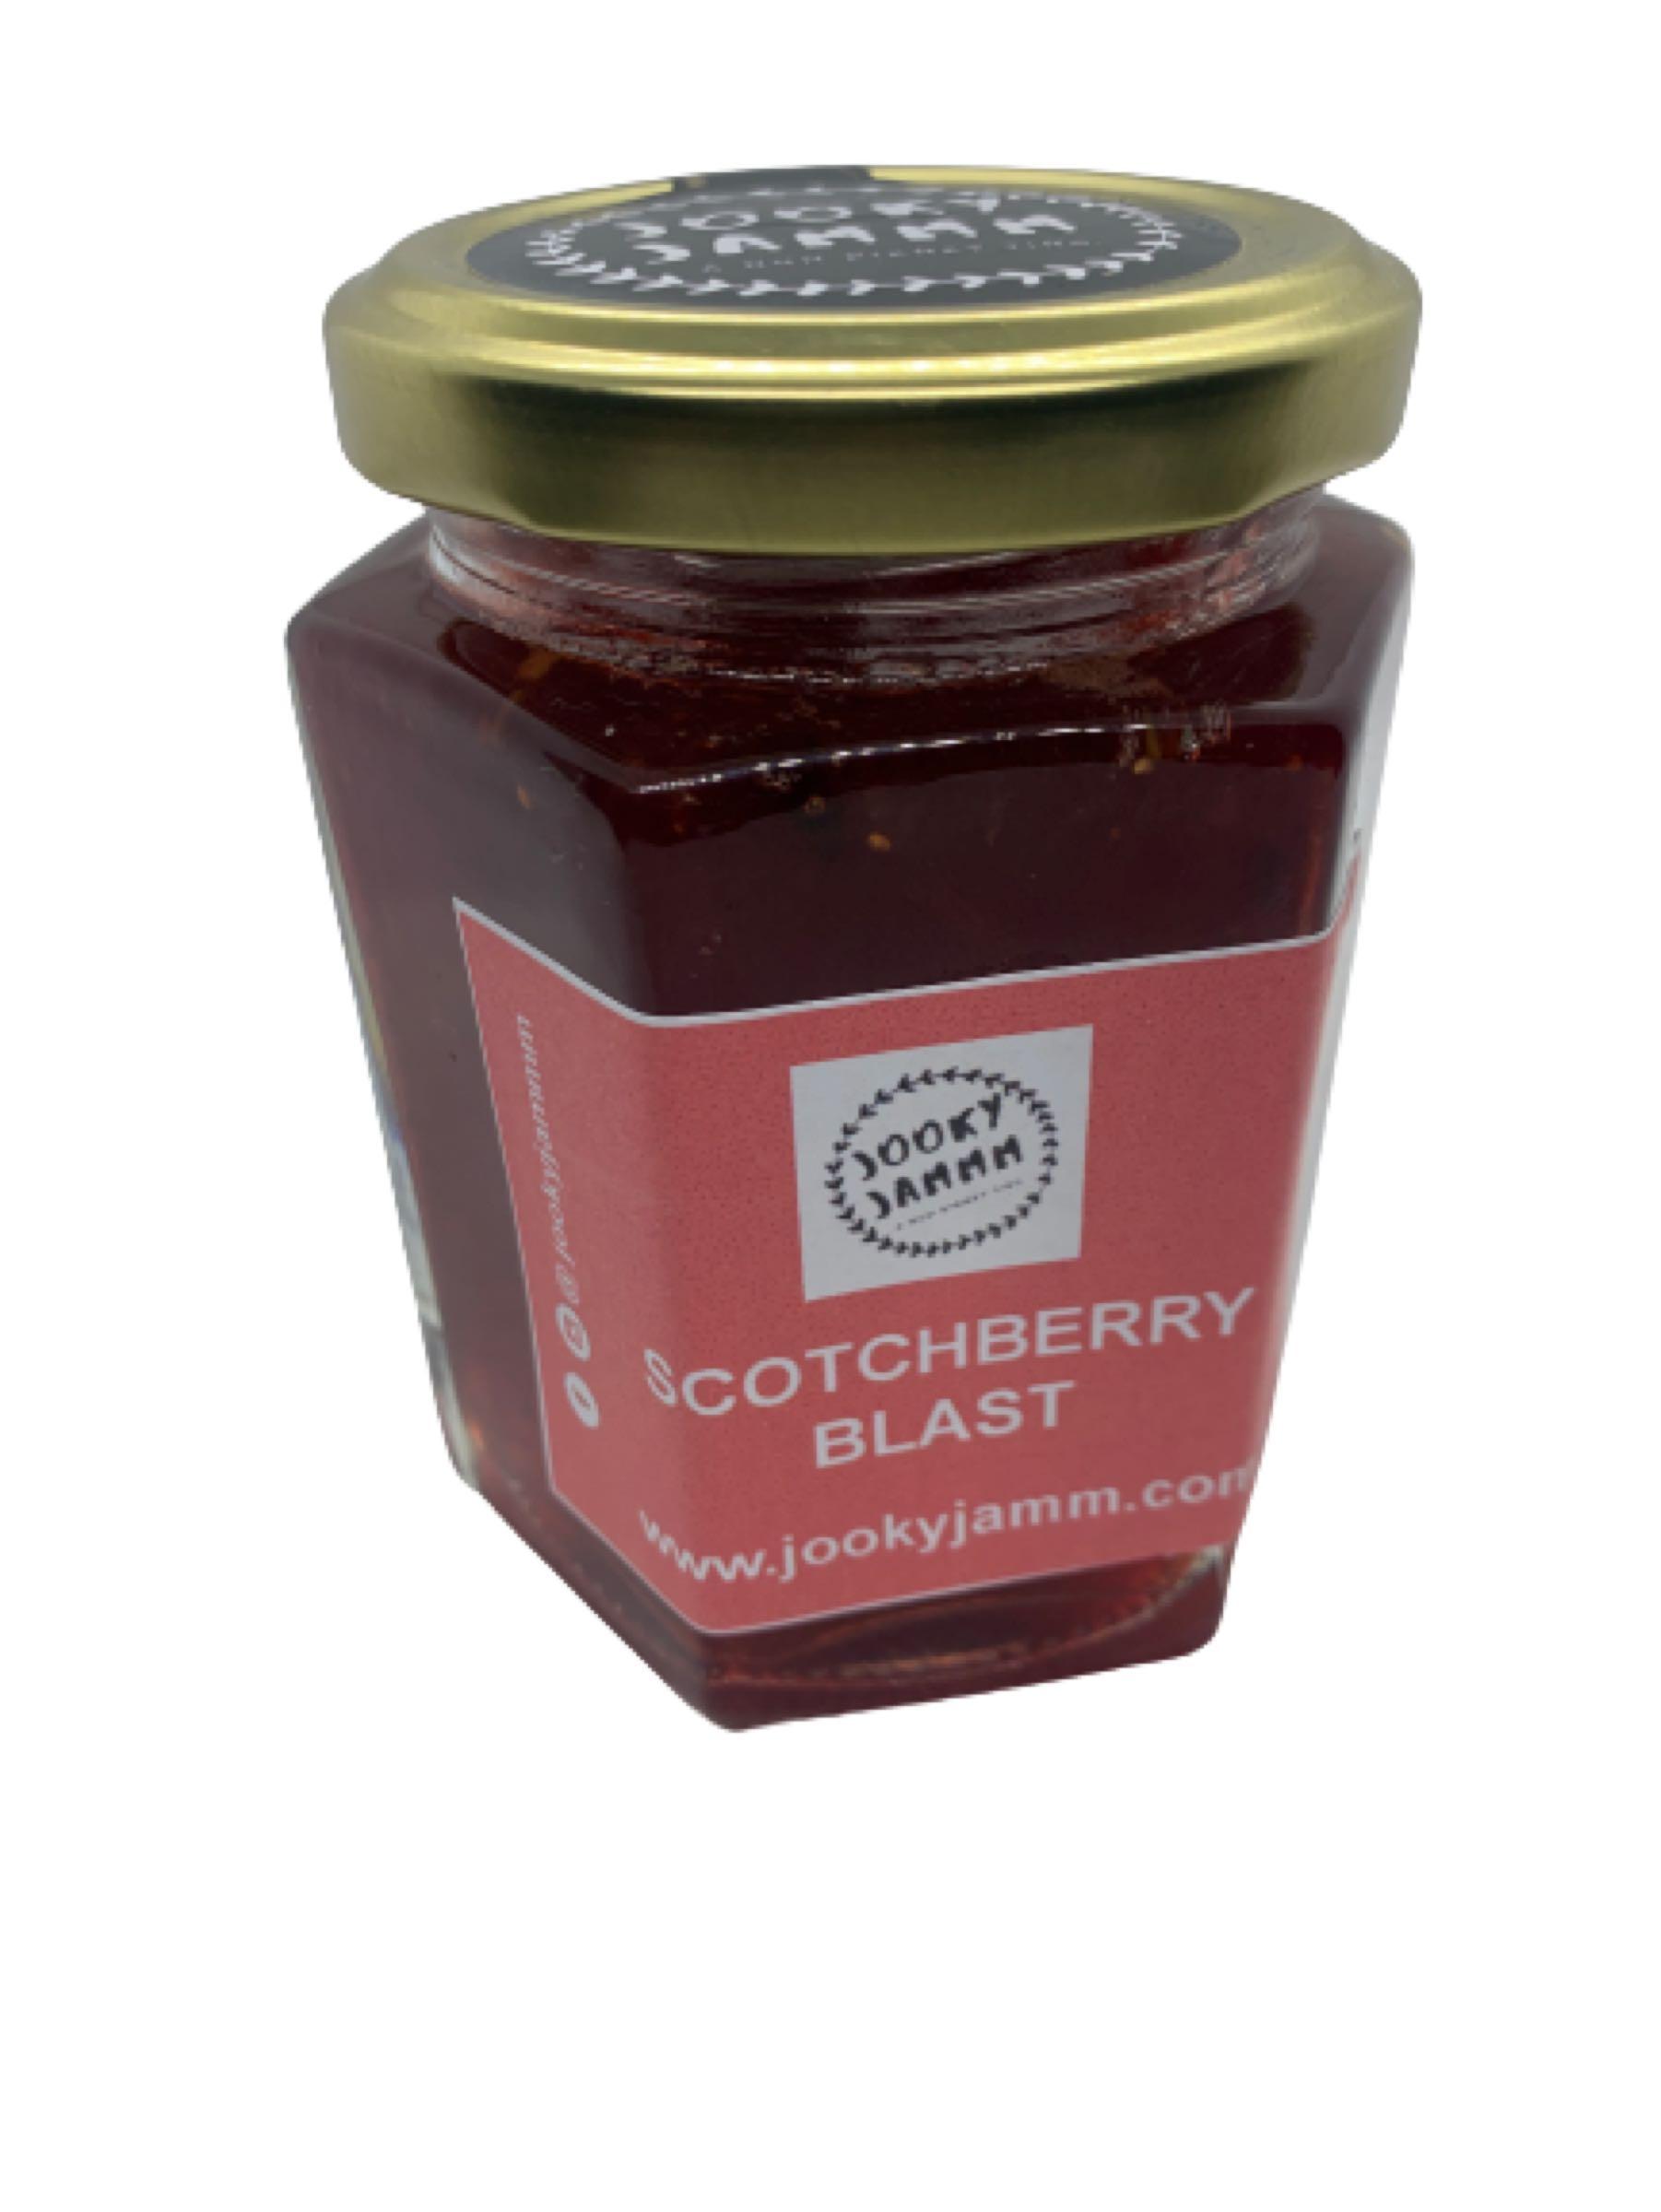 Jooky jammm Scotchberry Blast